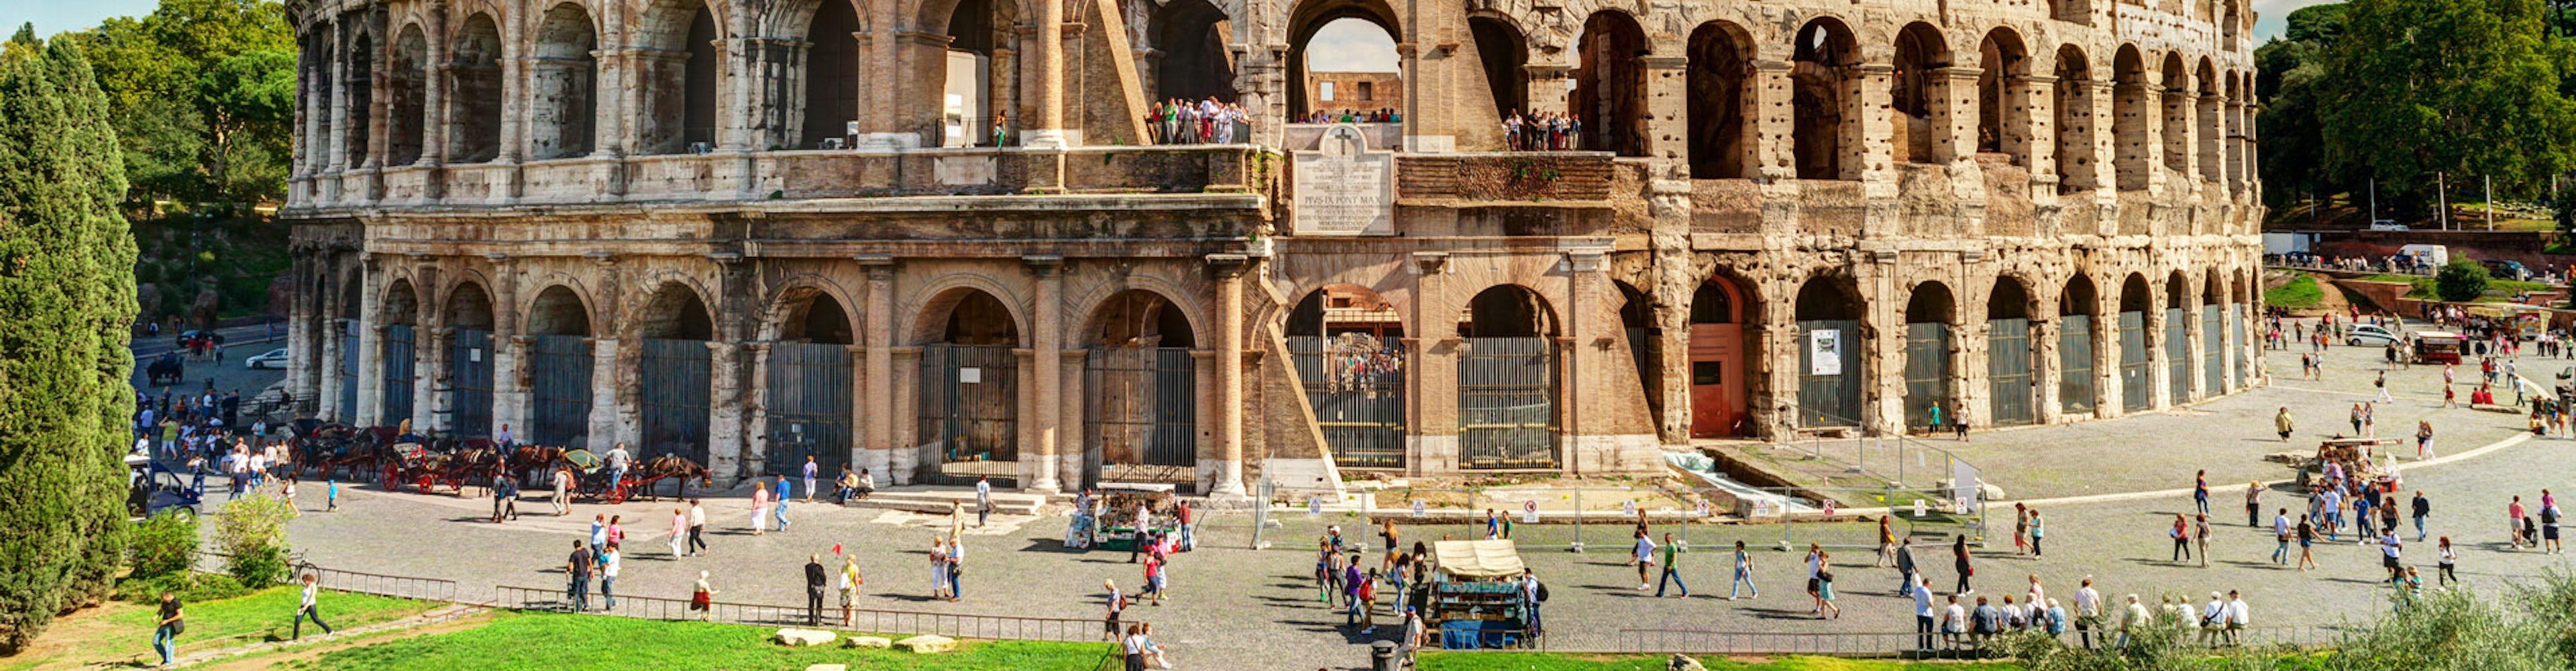 Visita guiada al Coliseo, Foro y Palatino